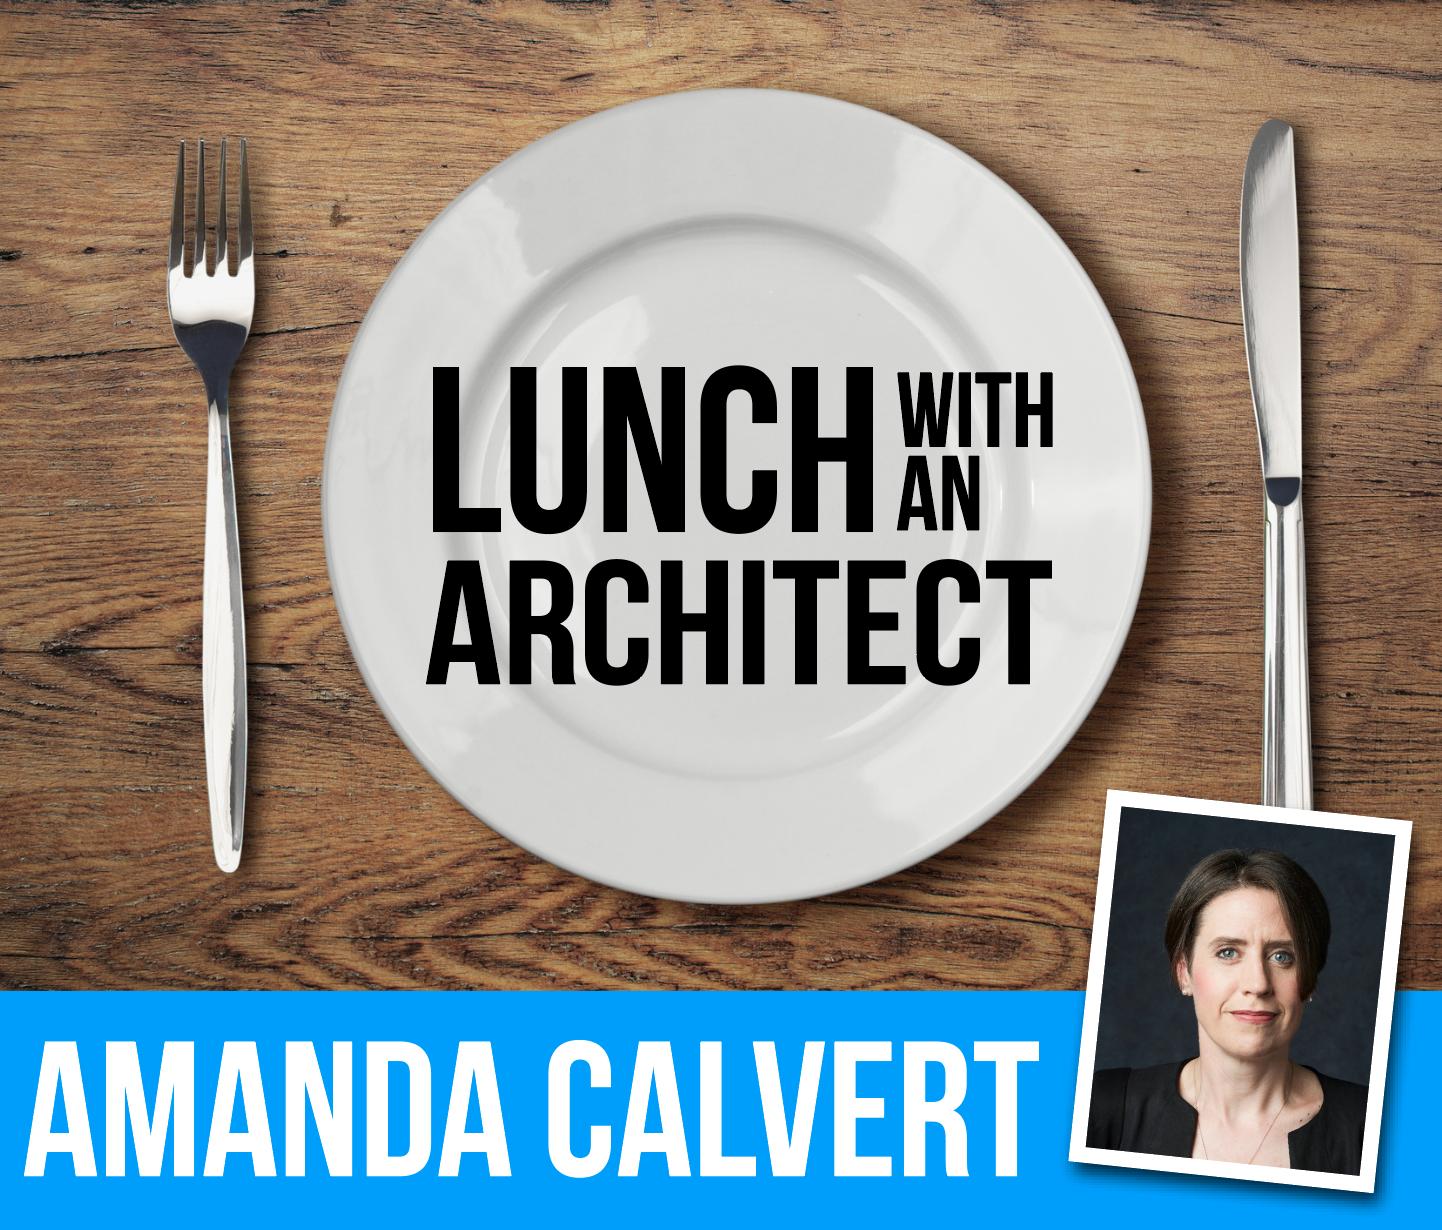 Lunch with Amanda Calvert